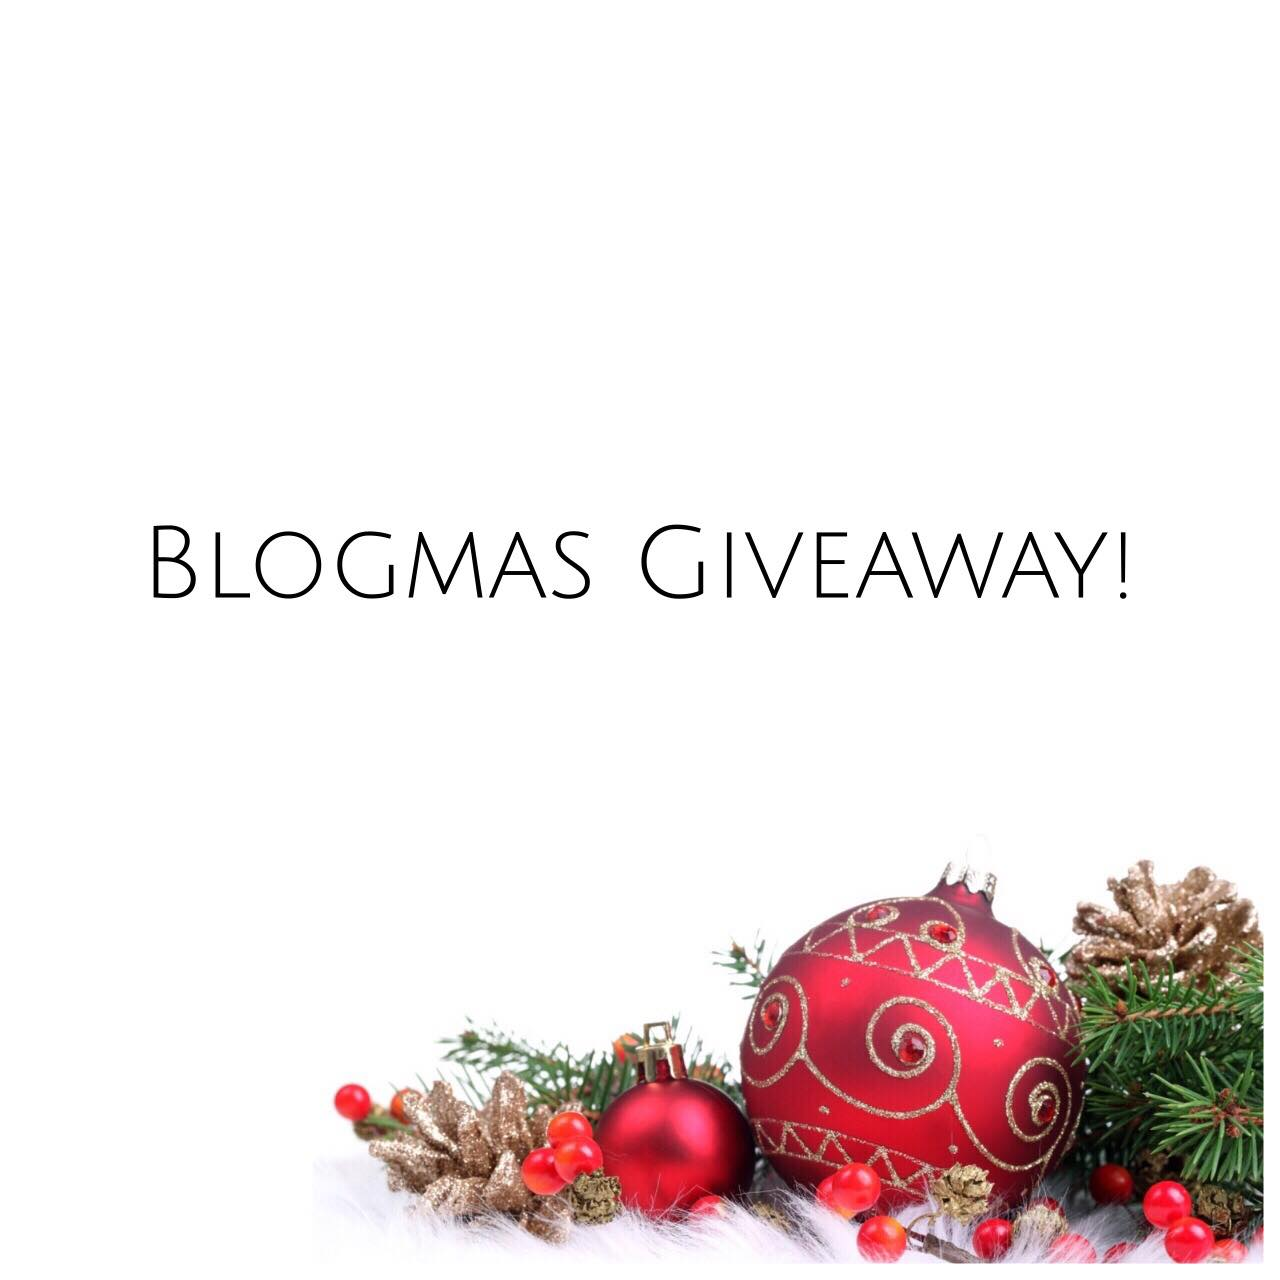 Blogmas Giveaway